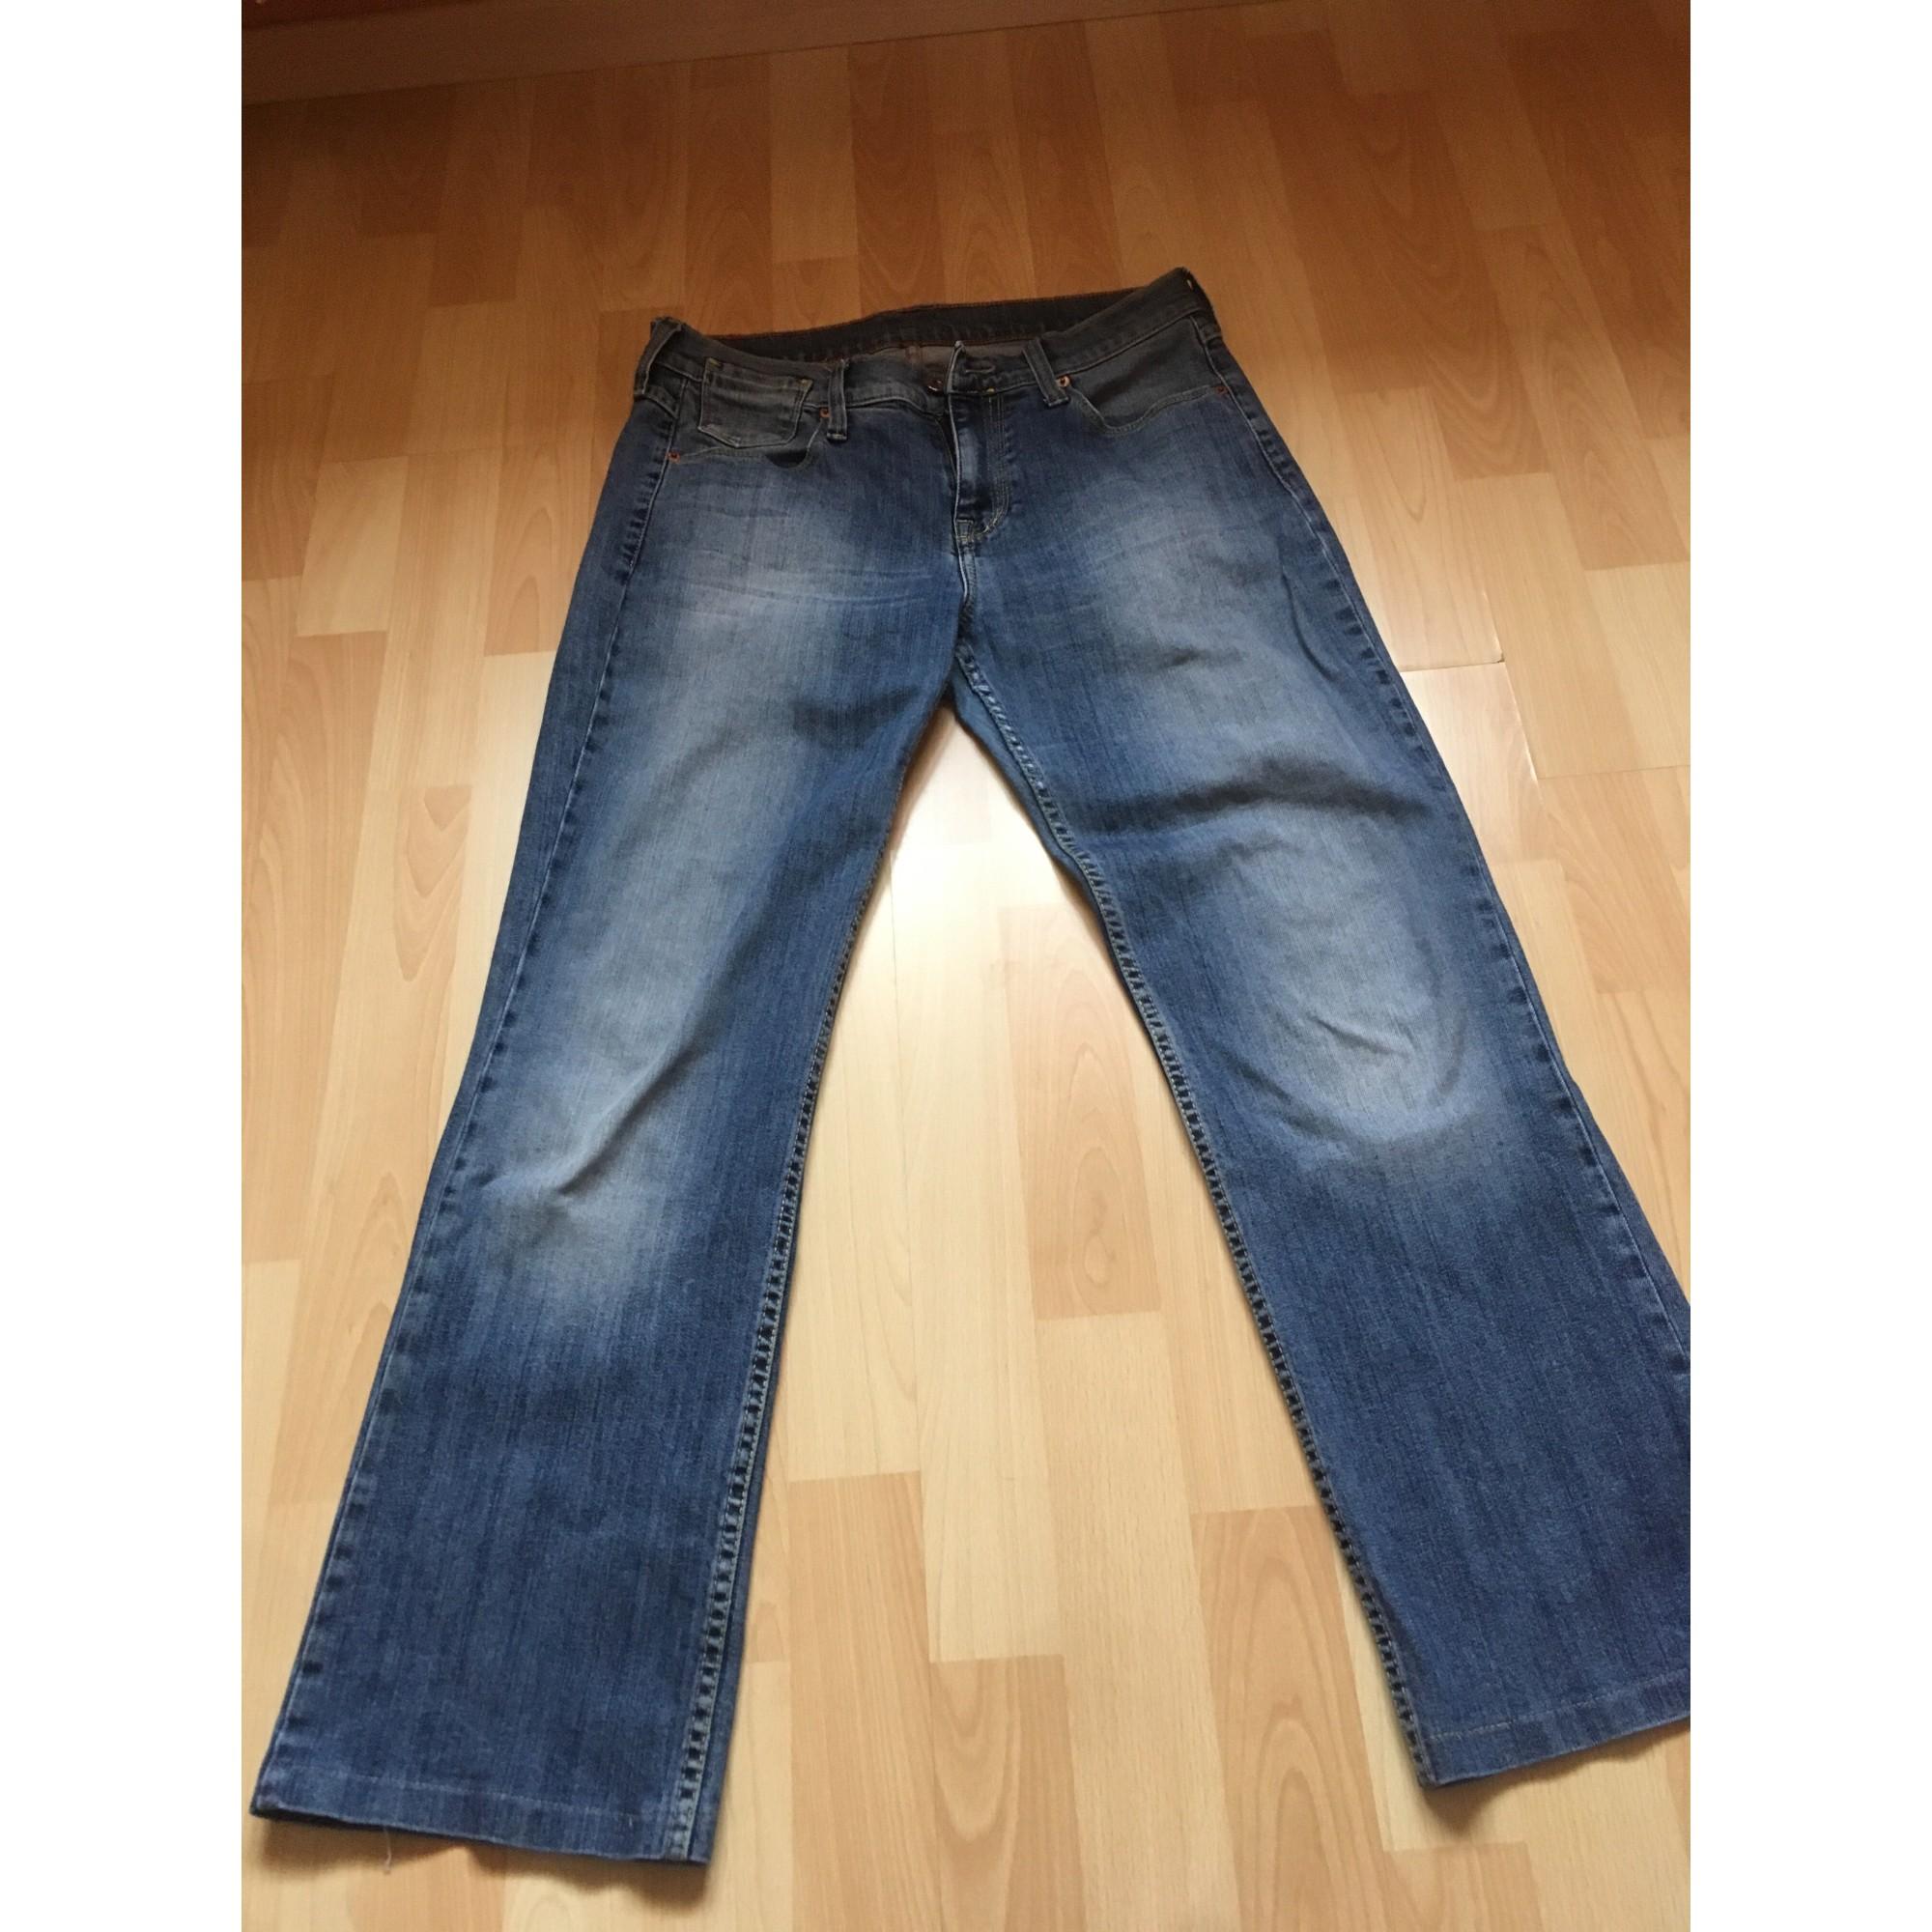 Jeans droit MUSTANG Bleu, bleu marine, bleu turquoise